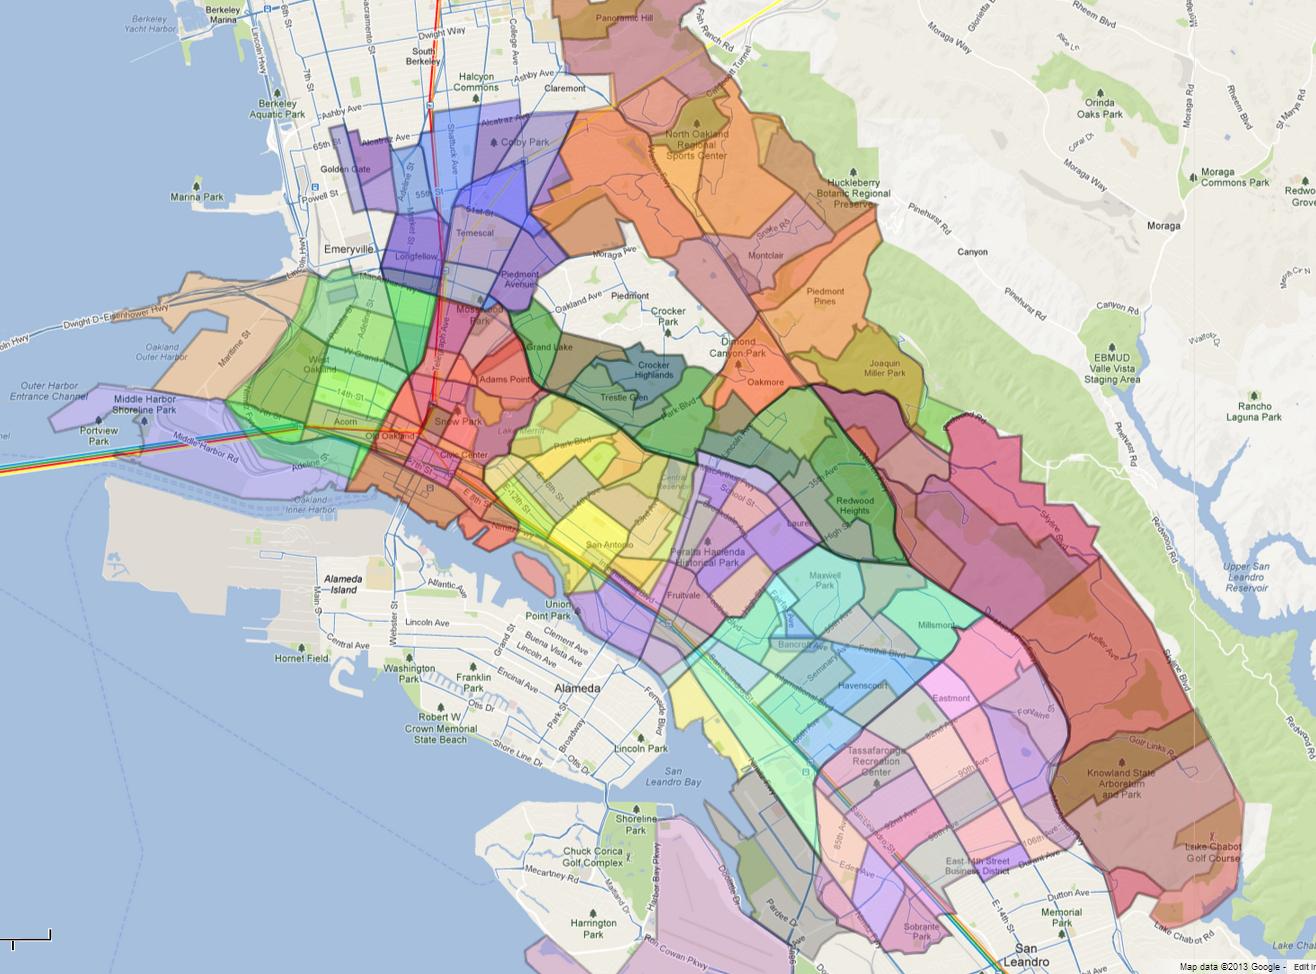 Neighborhoods Districts Maps Of California Map Of Oakland California - Oakland California Map